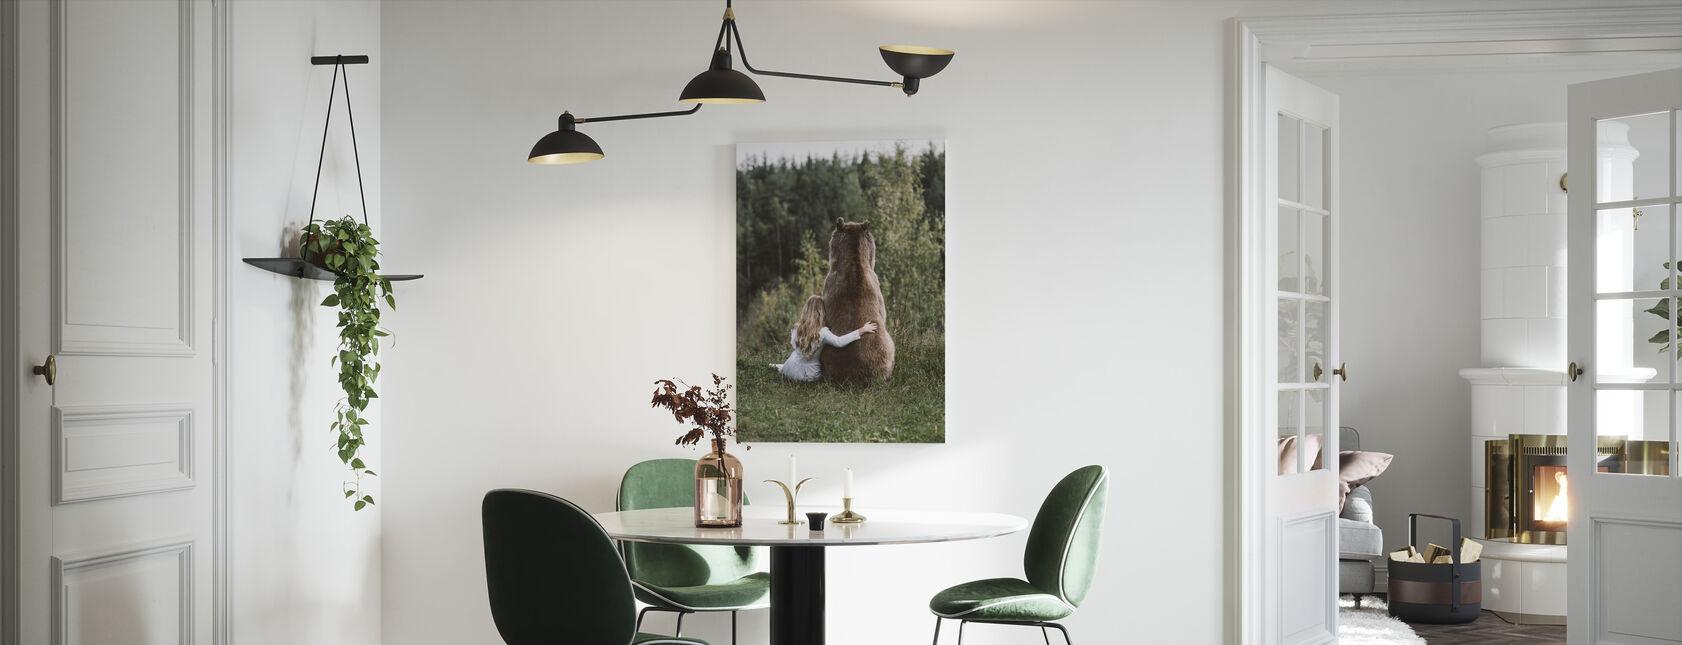 Björnkram - Canvastavla - Kök